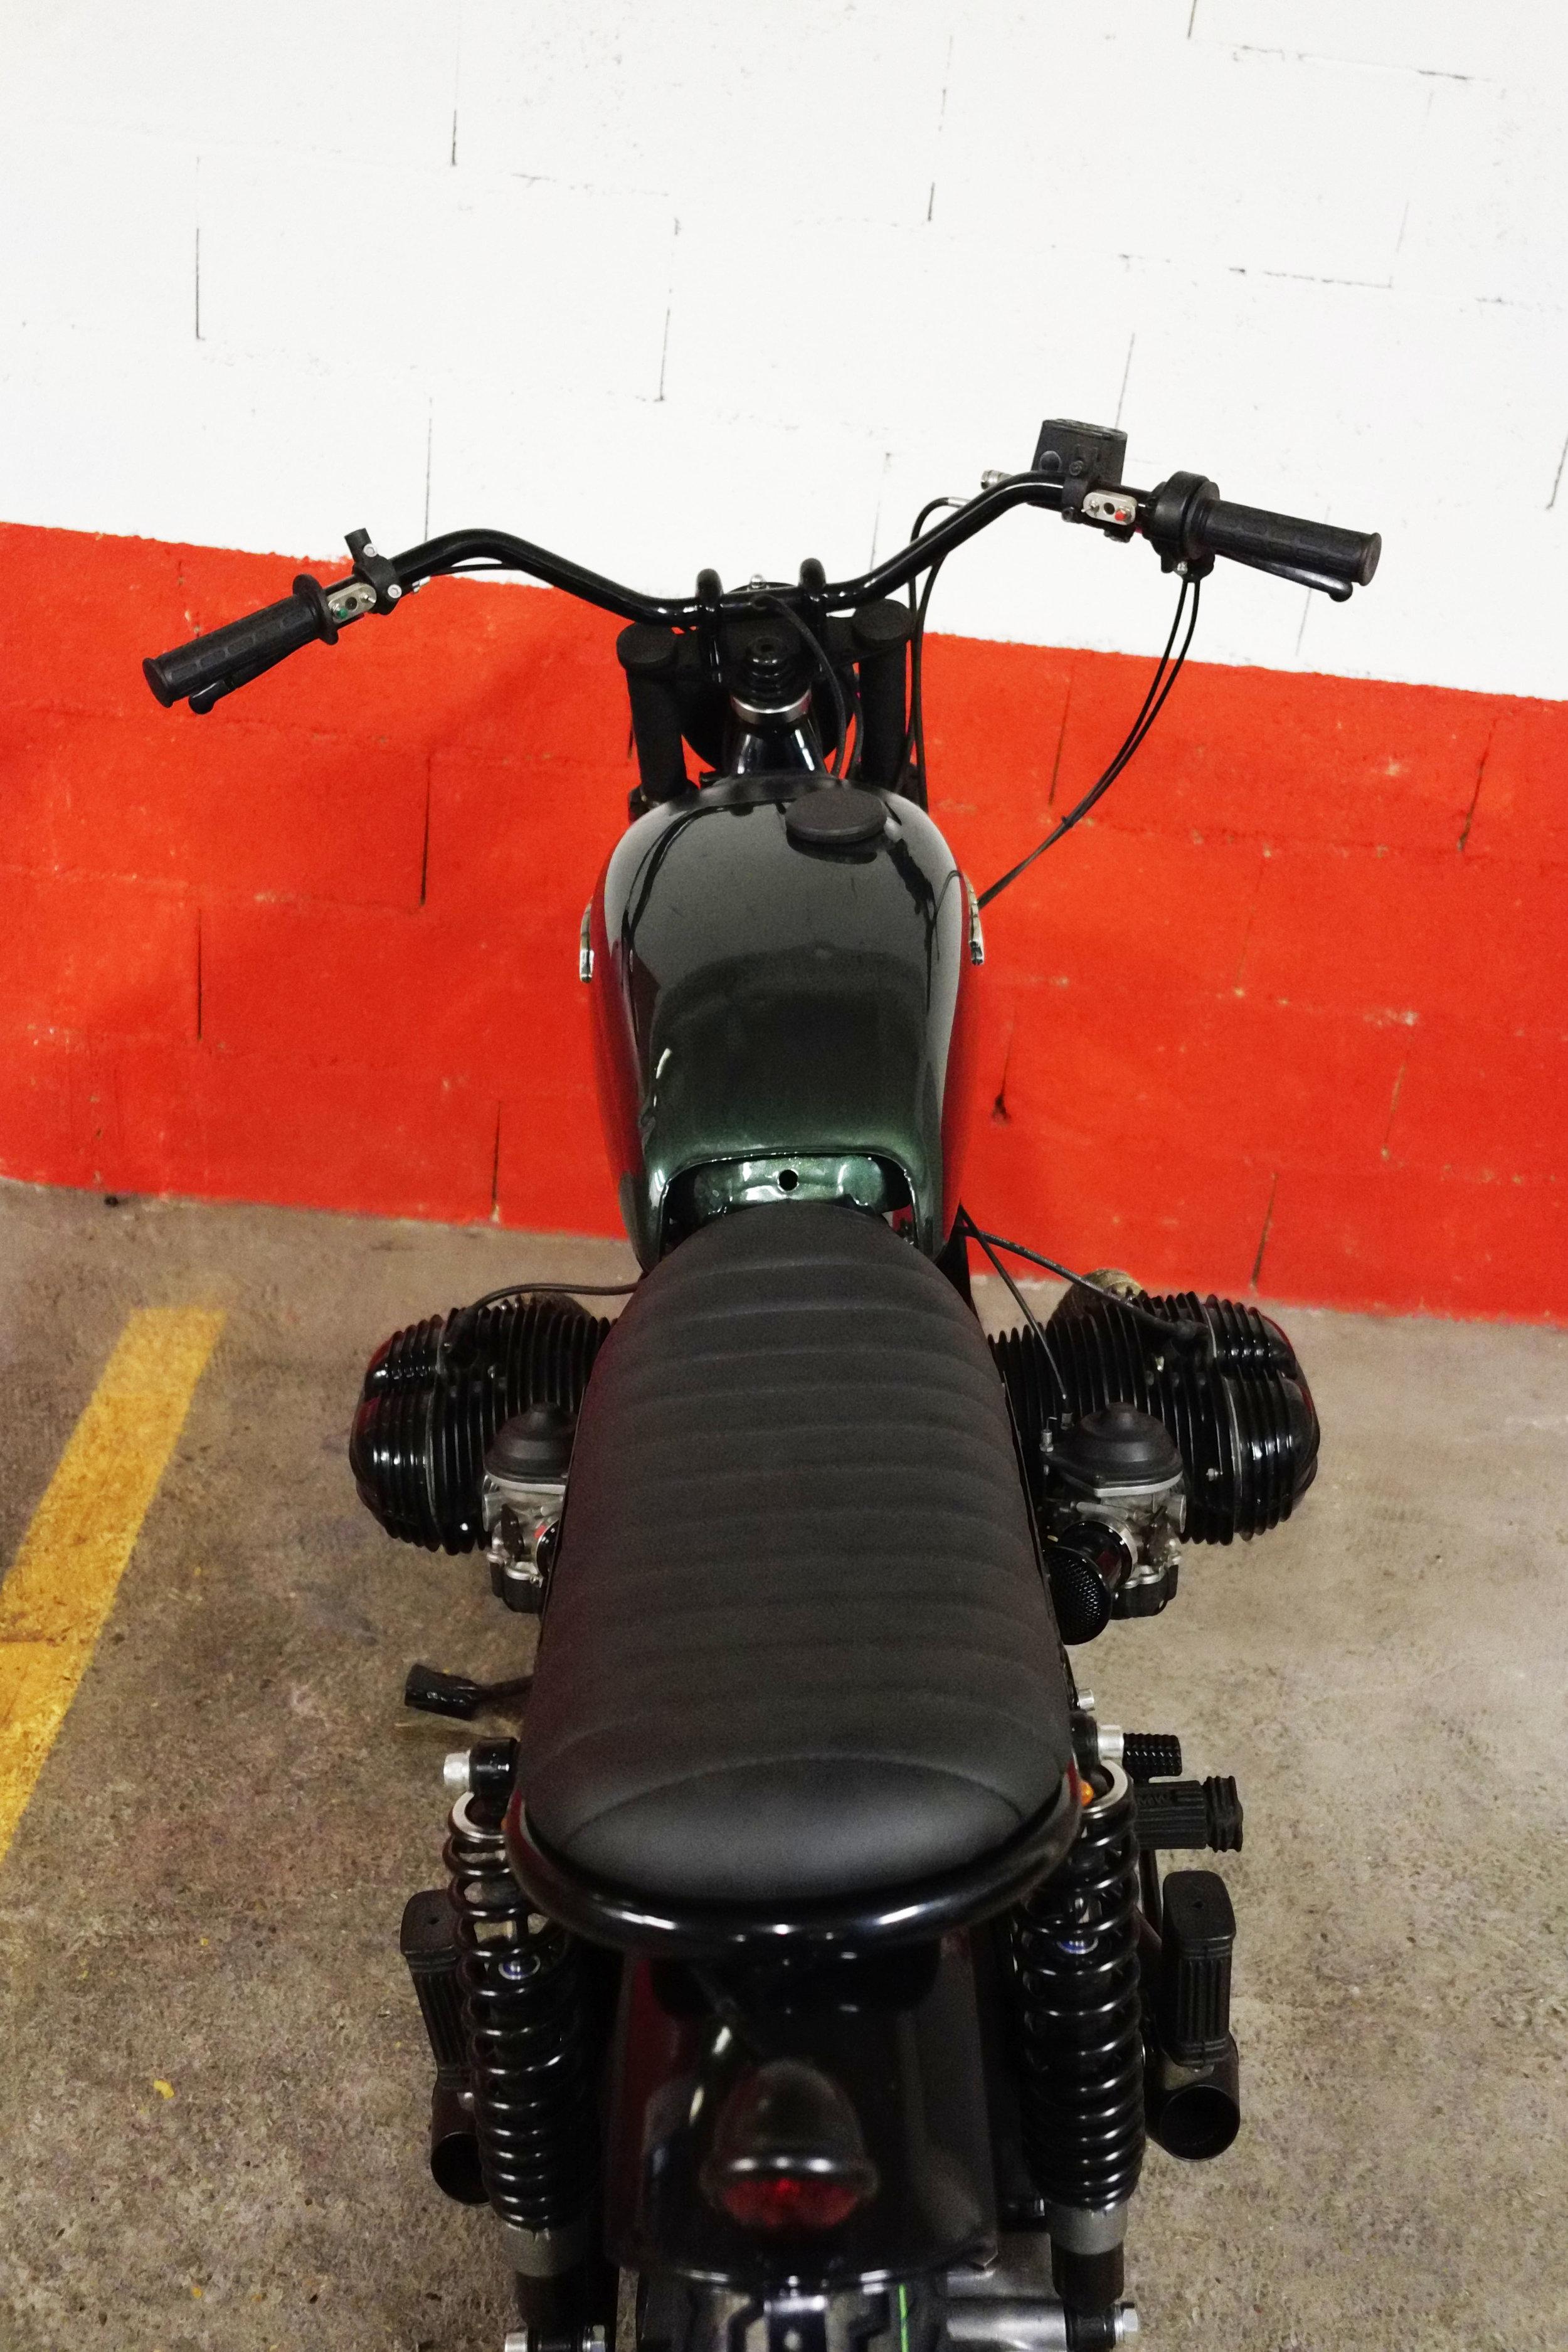 - bespoke rear loop;  - bespoke seat designed to match with the bespoke rear loop;  -  Bates  tail light.